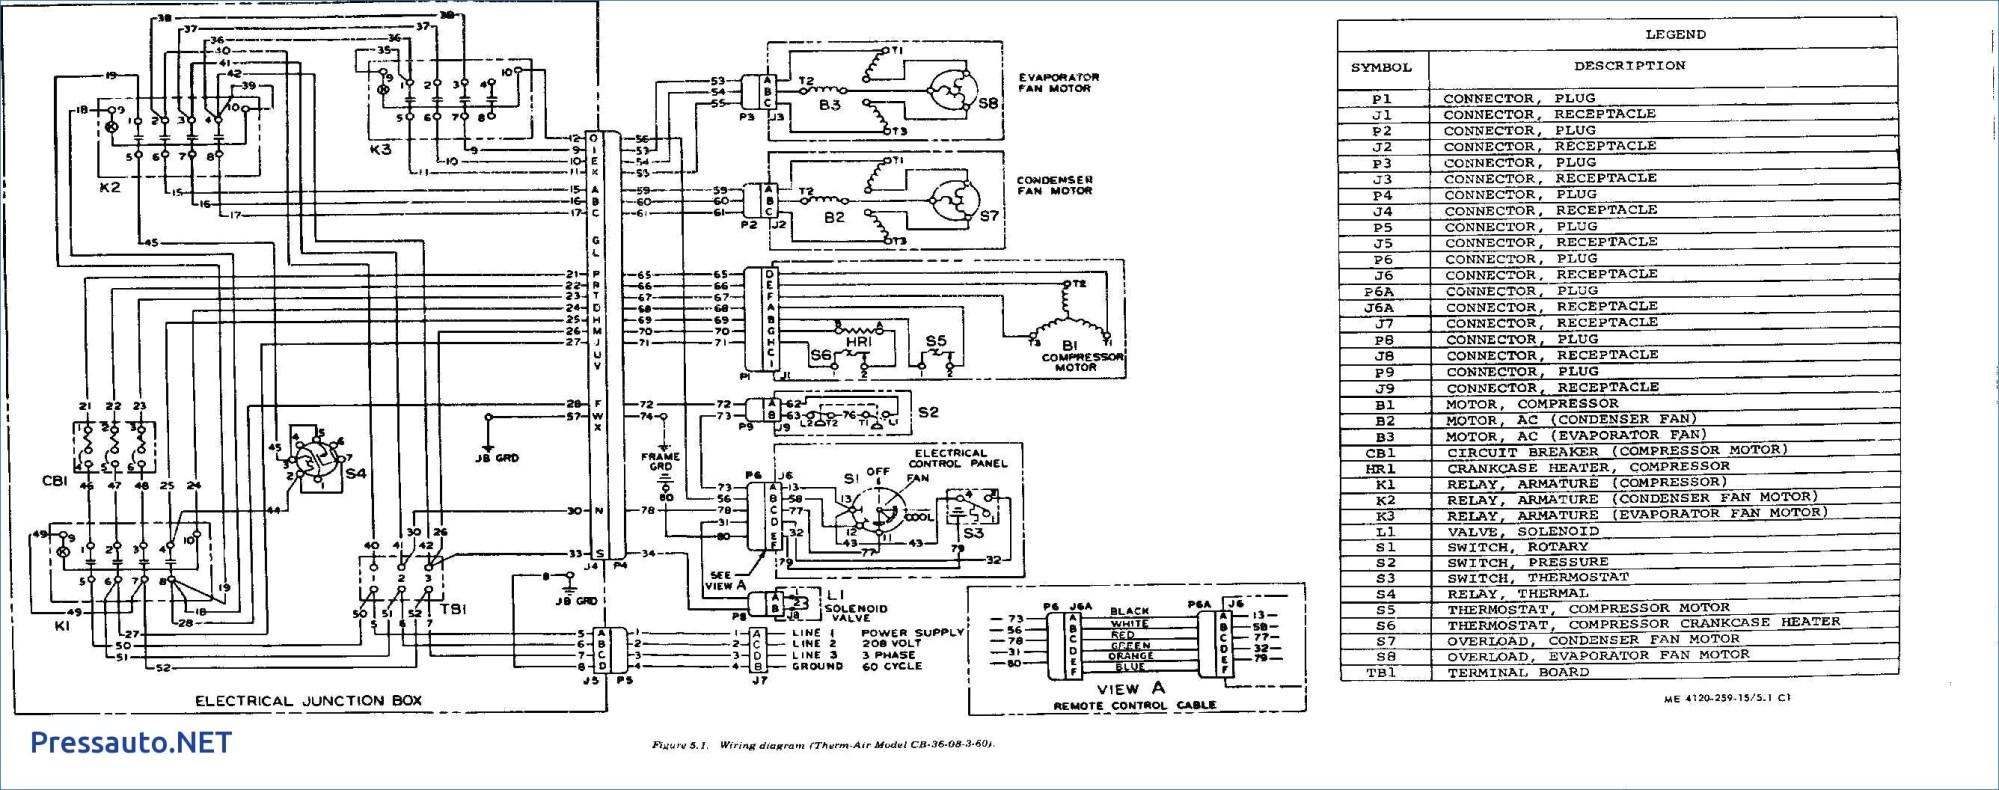 hight resolution of trane condenser wiring diagram phase 1 data wiring diagrams u2022 rh myarogya co trane wiring diagrams